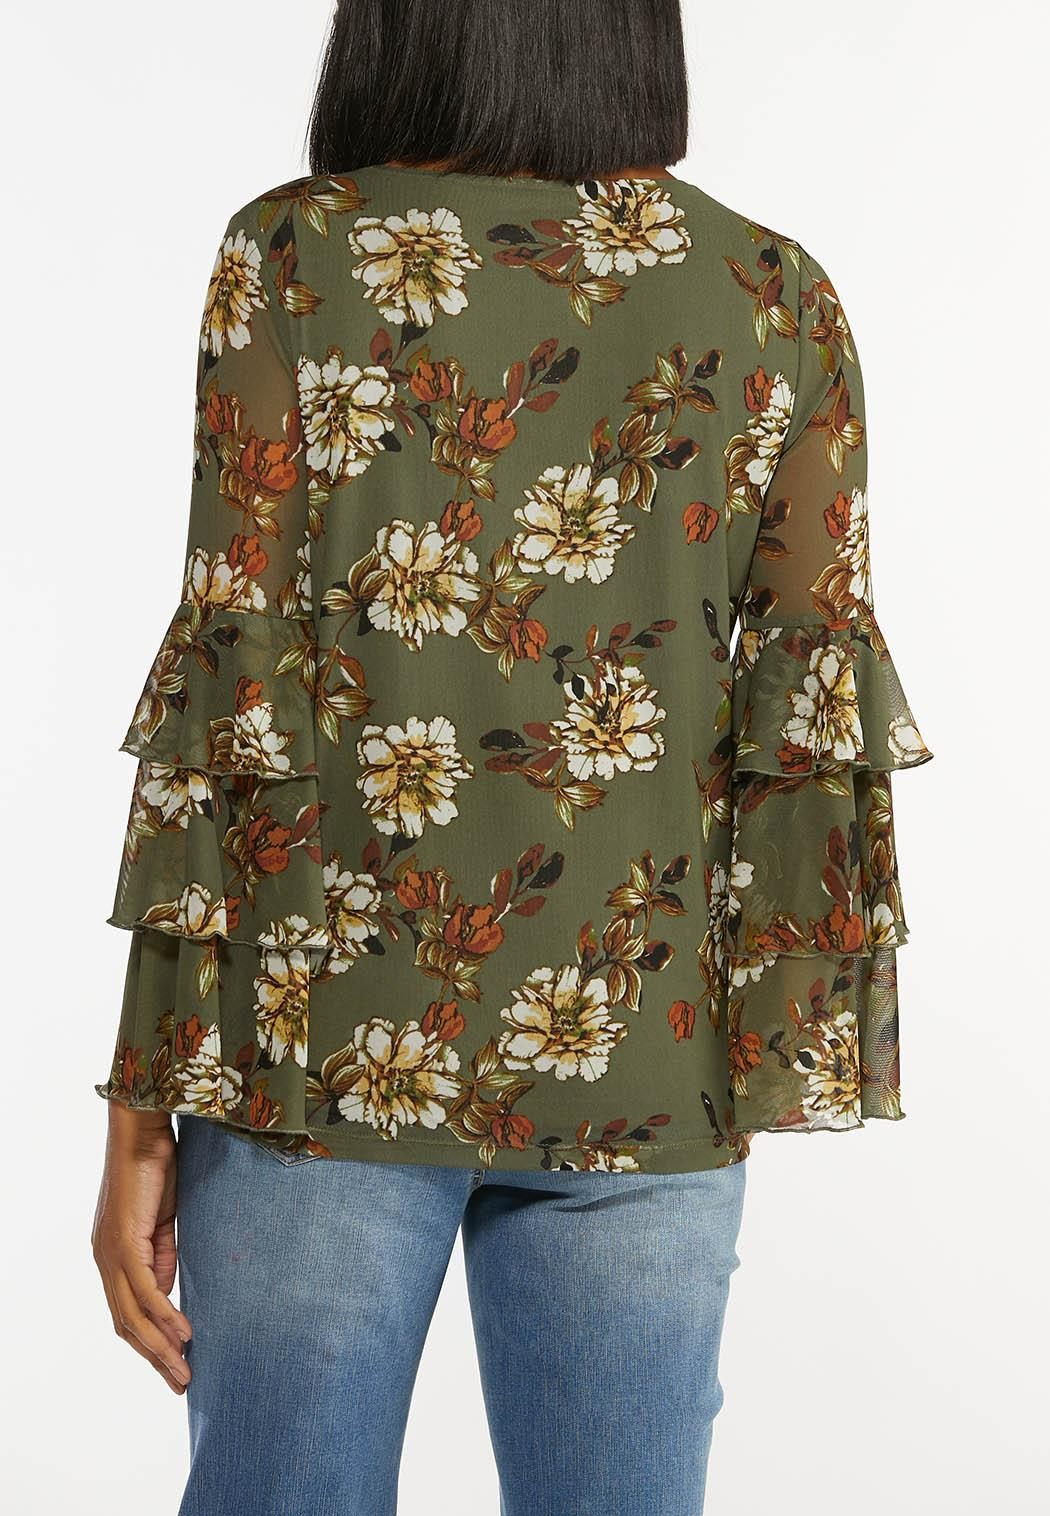 Plus Size Olive Mesh Floral Top (Item #44436145)